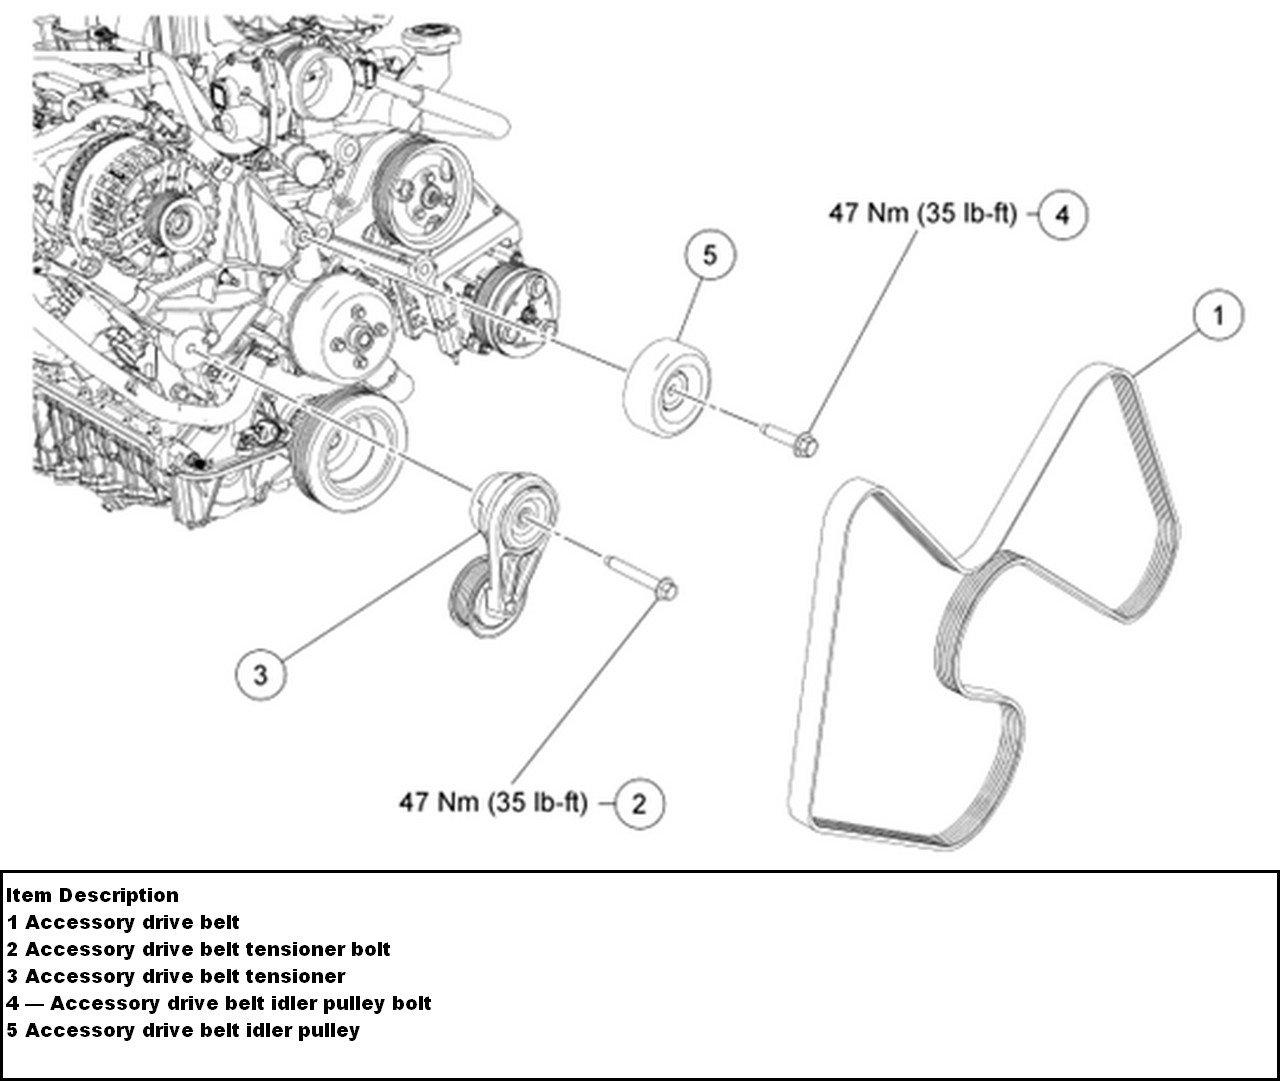 GY_2893] Belt Diagram Ford 302 Serpentine Belt Diagram Timing Belt Diagram  Ford Wiring DiagramJitt Ultr Oupli Ospor Cajos Mohammedshrine Librar Wiring 101